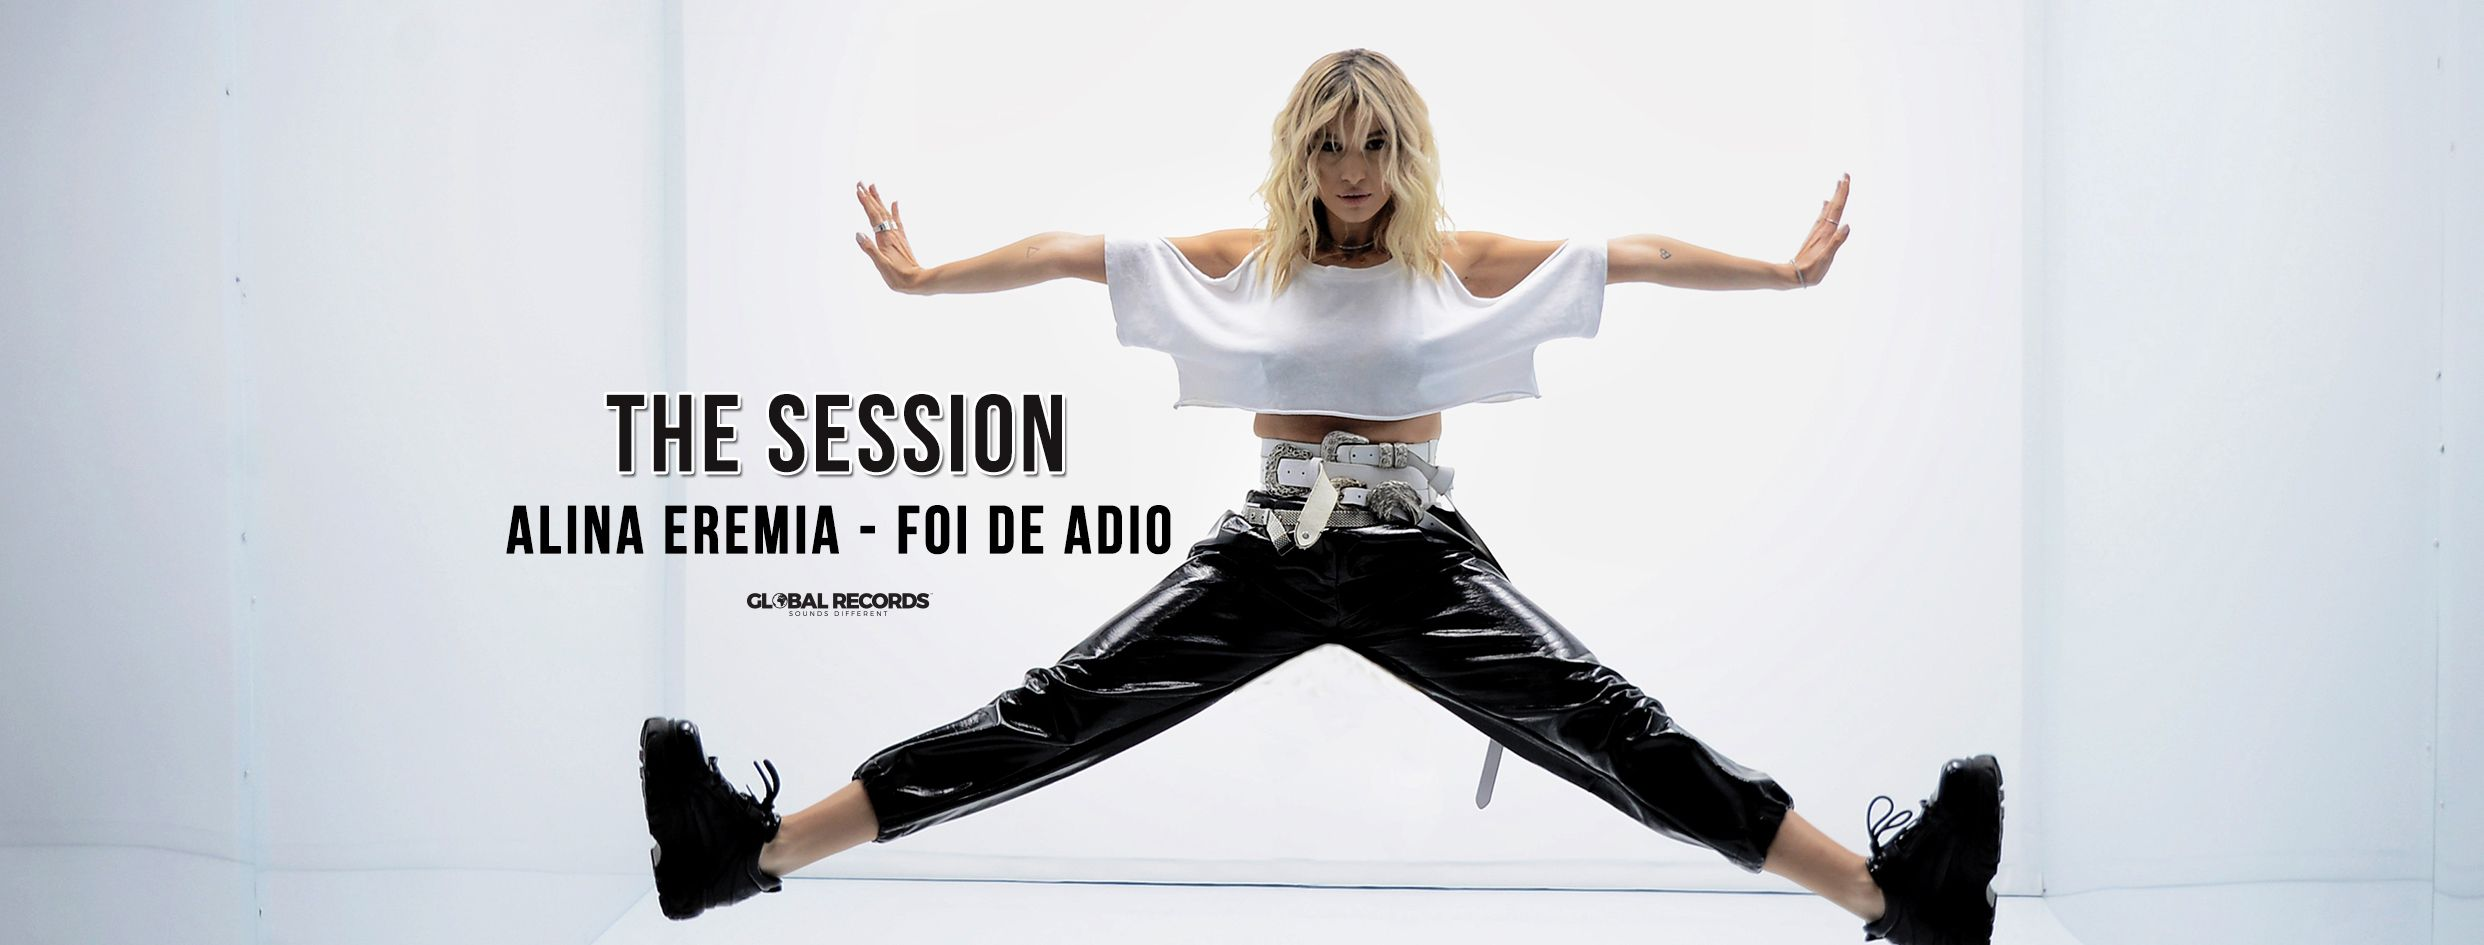 "THE SESSION: Alina Eremia lanseaza piesa ""Foi de adio"" – cu un vizual care ii pune in evidenta personalitatea puternica"